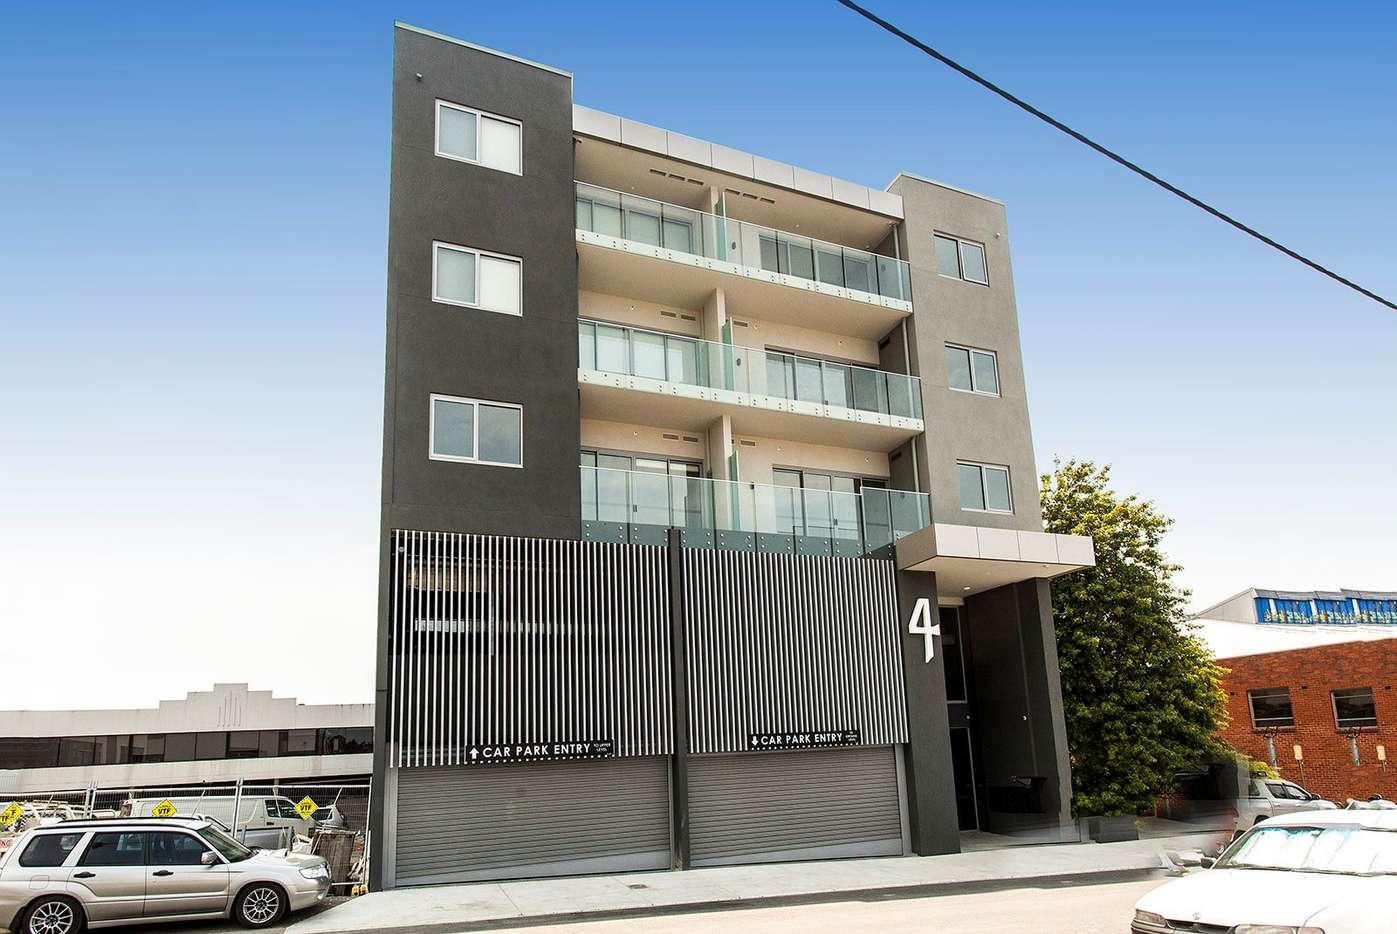 Main view of Homely apartment listing, 206/4 Villa Street, Heidelberg, VIC 3084